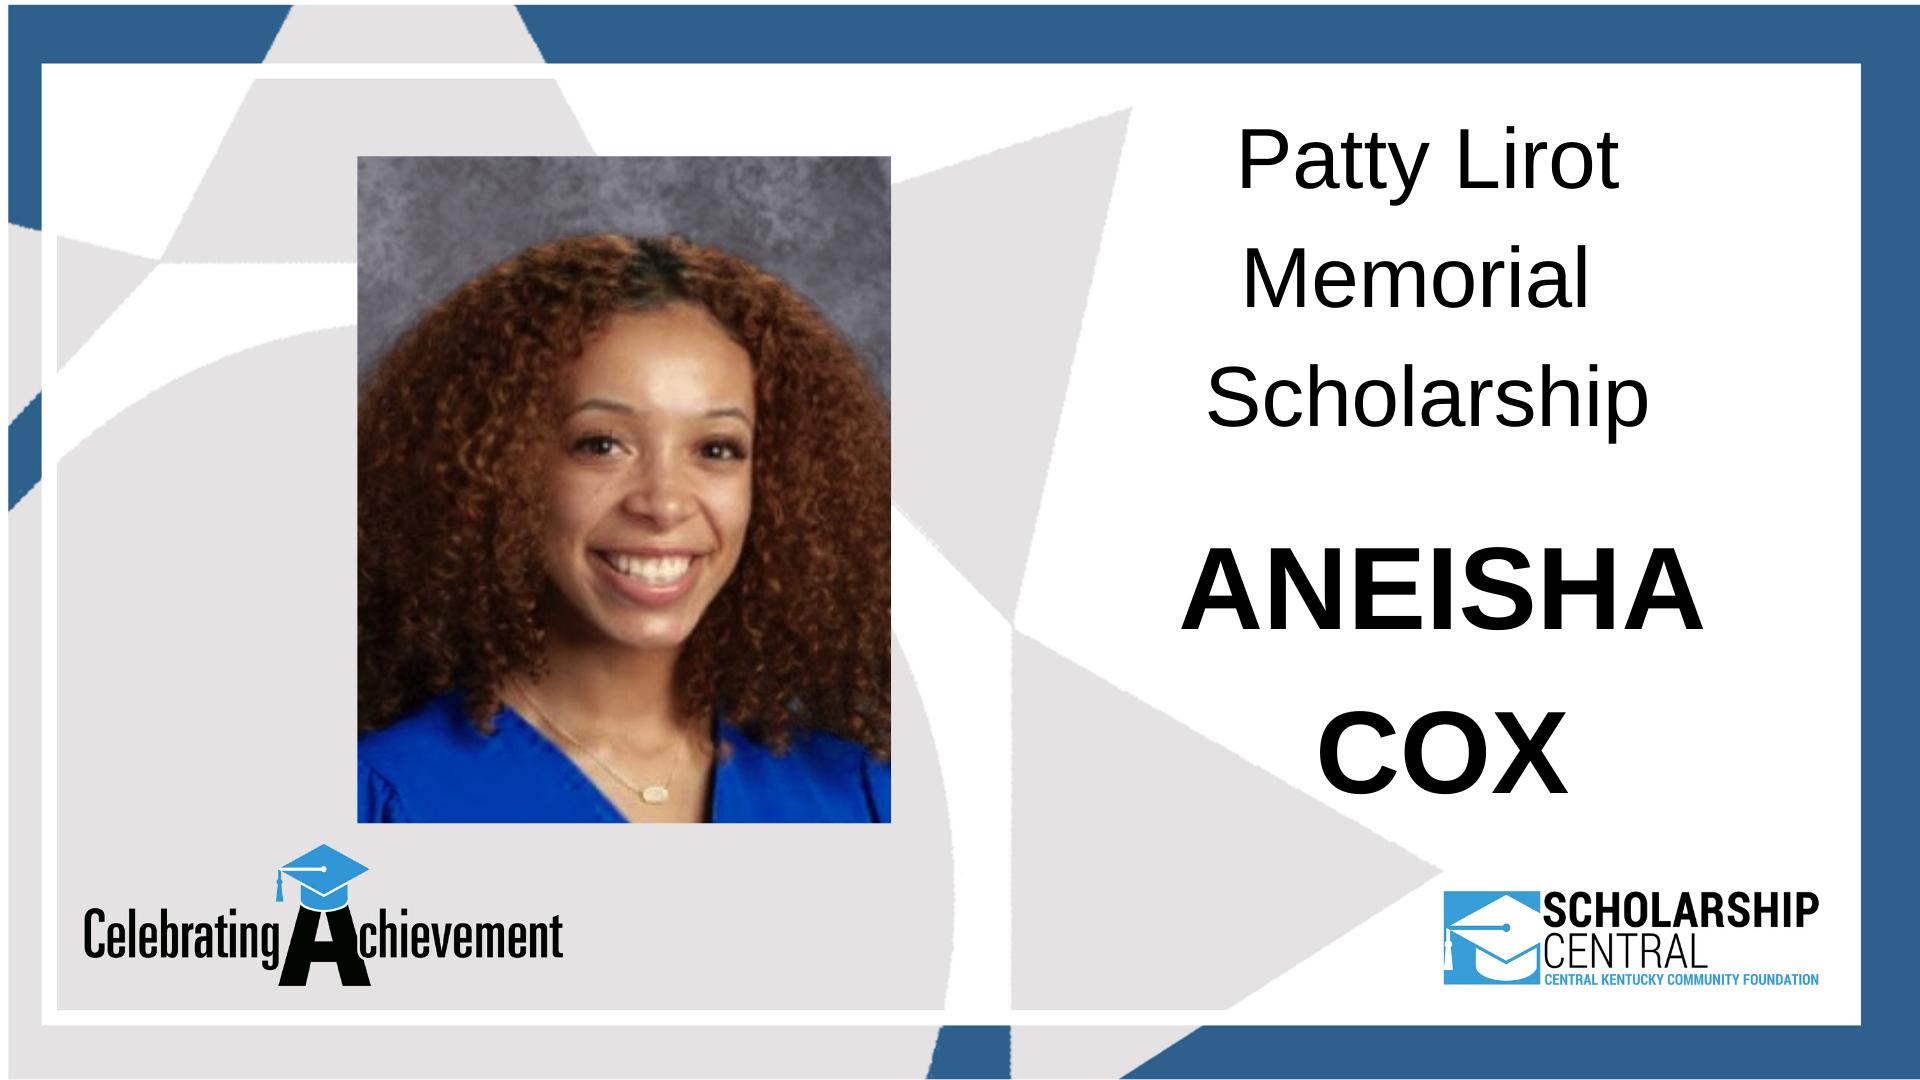 Patty Lirot Scholarship